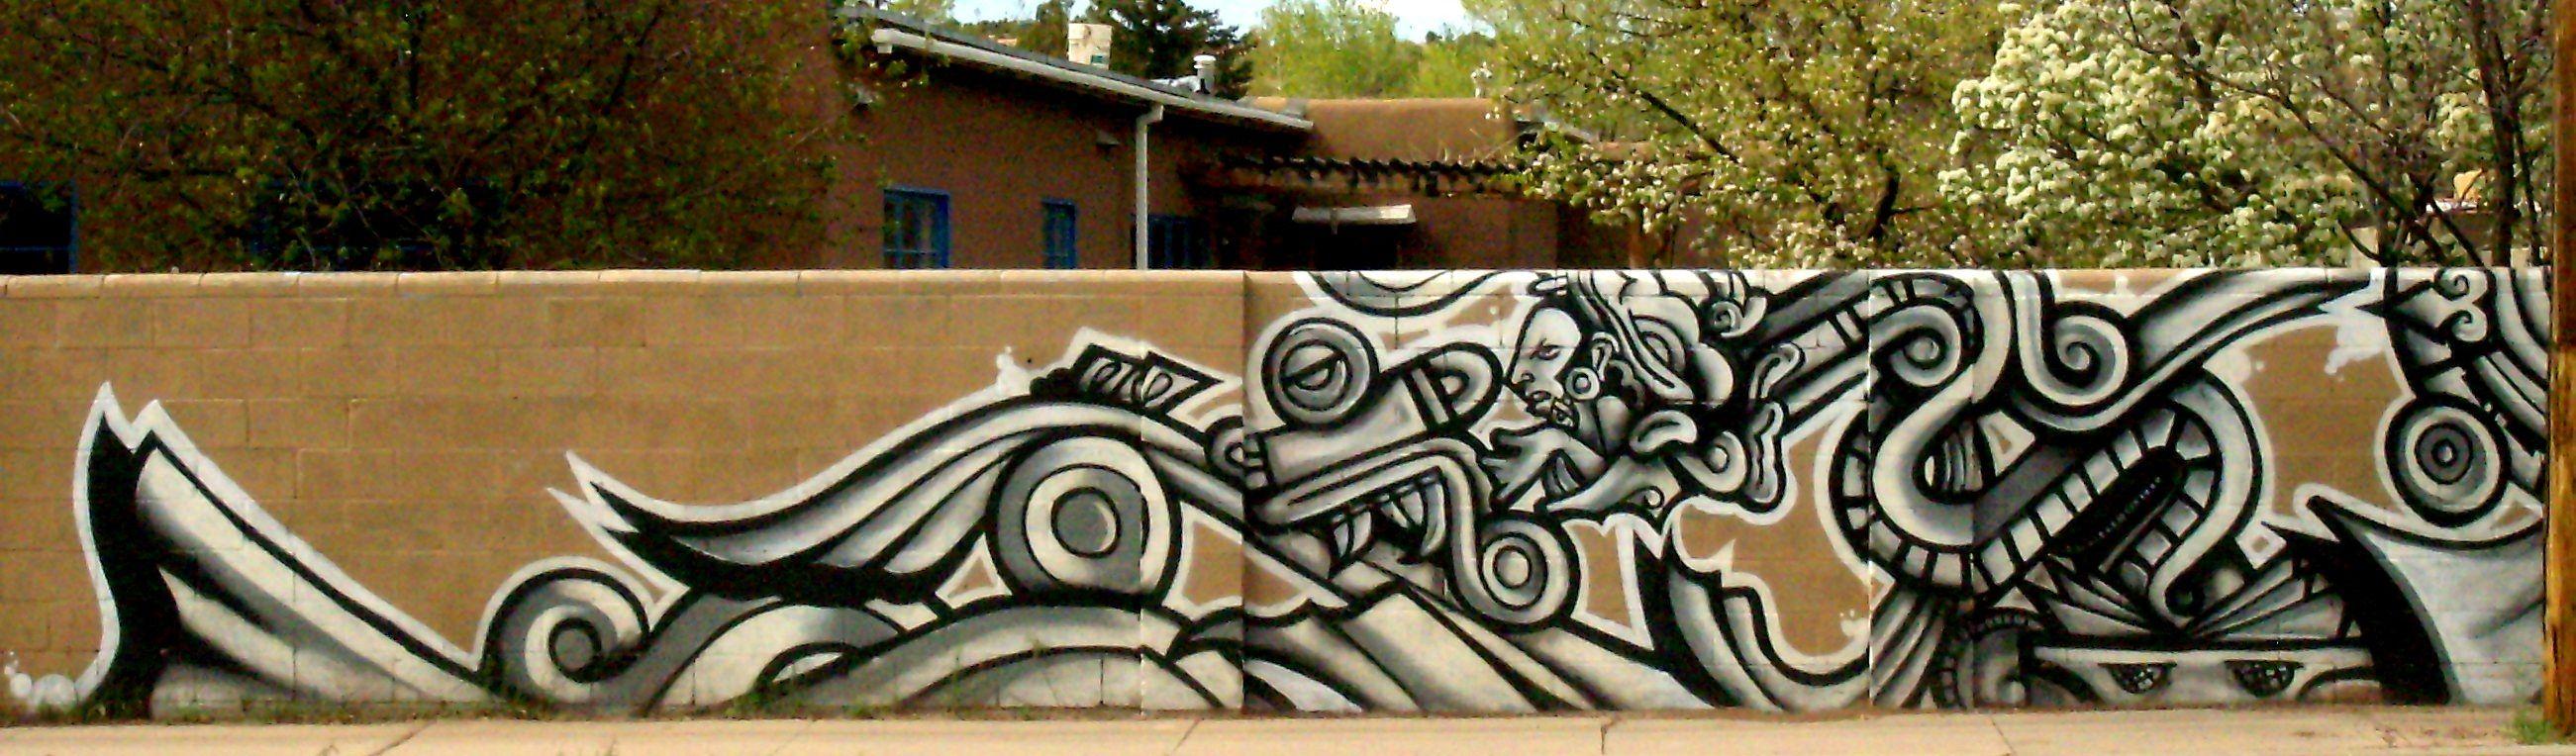 Aztec mayan graffiti dissertation pinterest graffiti for Aztec mural painting